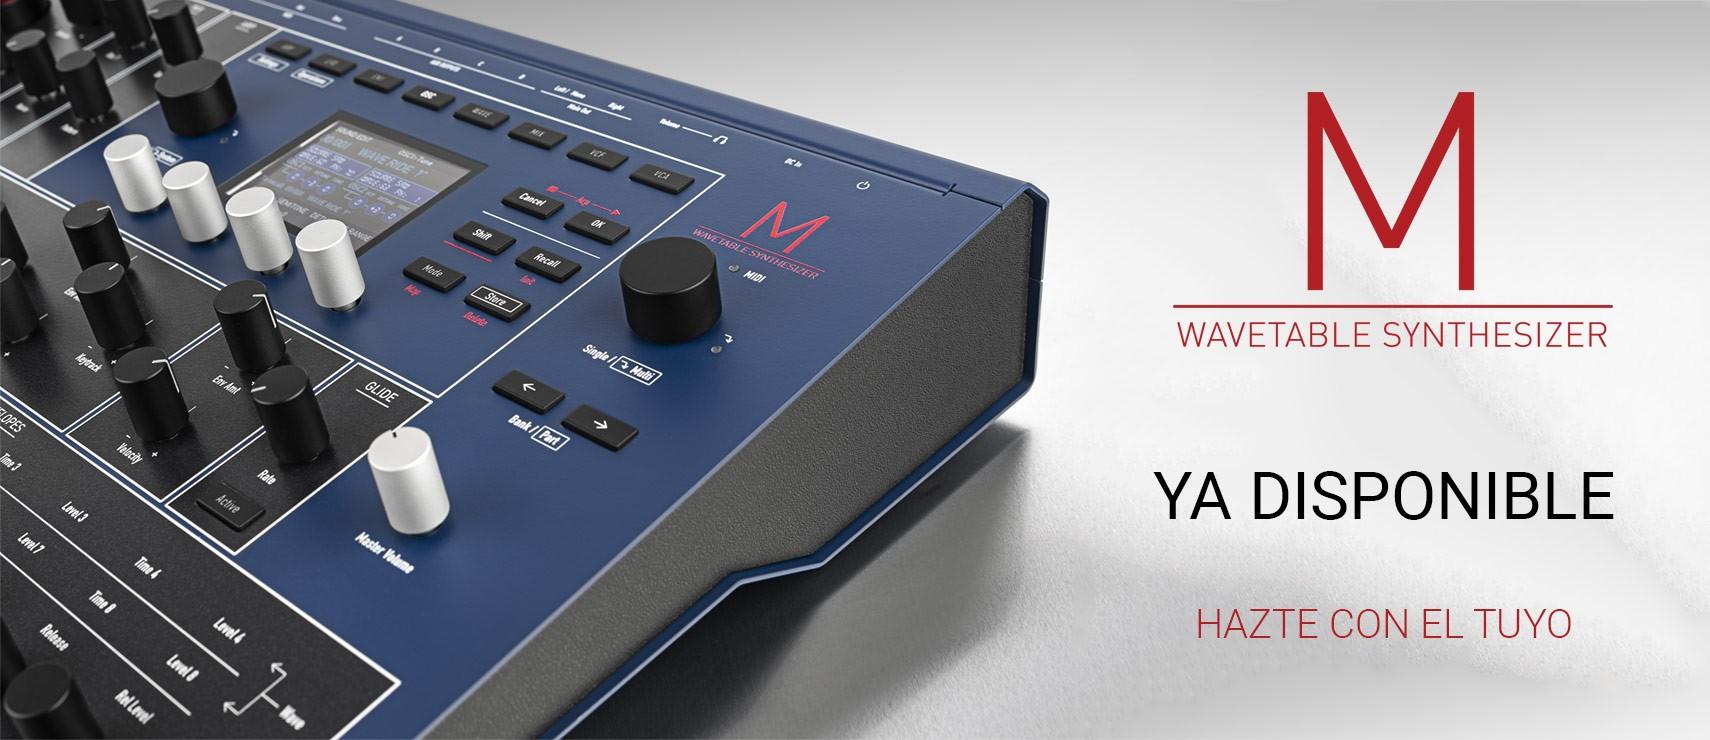 Waldor M Wavetable Synthesizer ya disponible